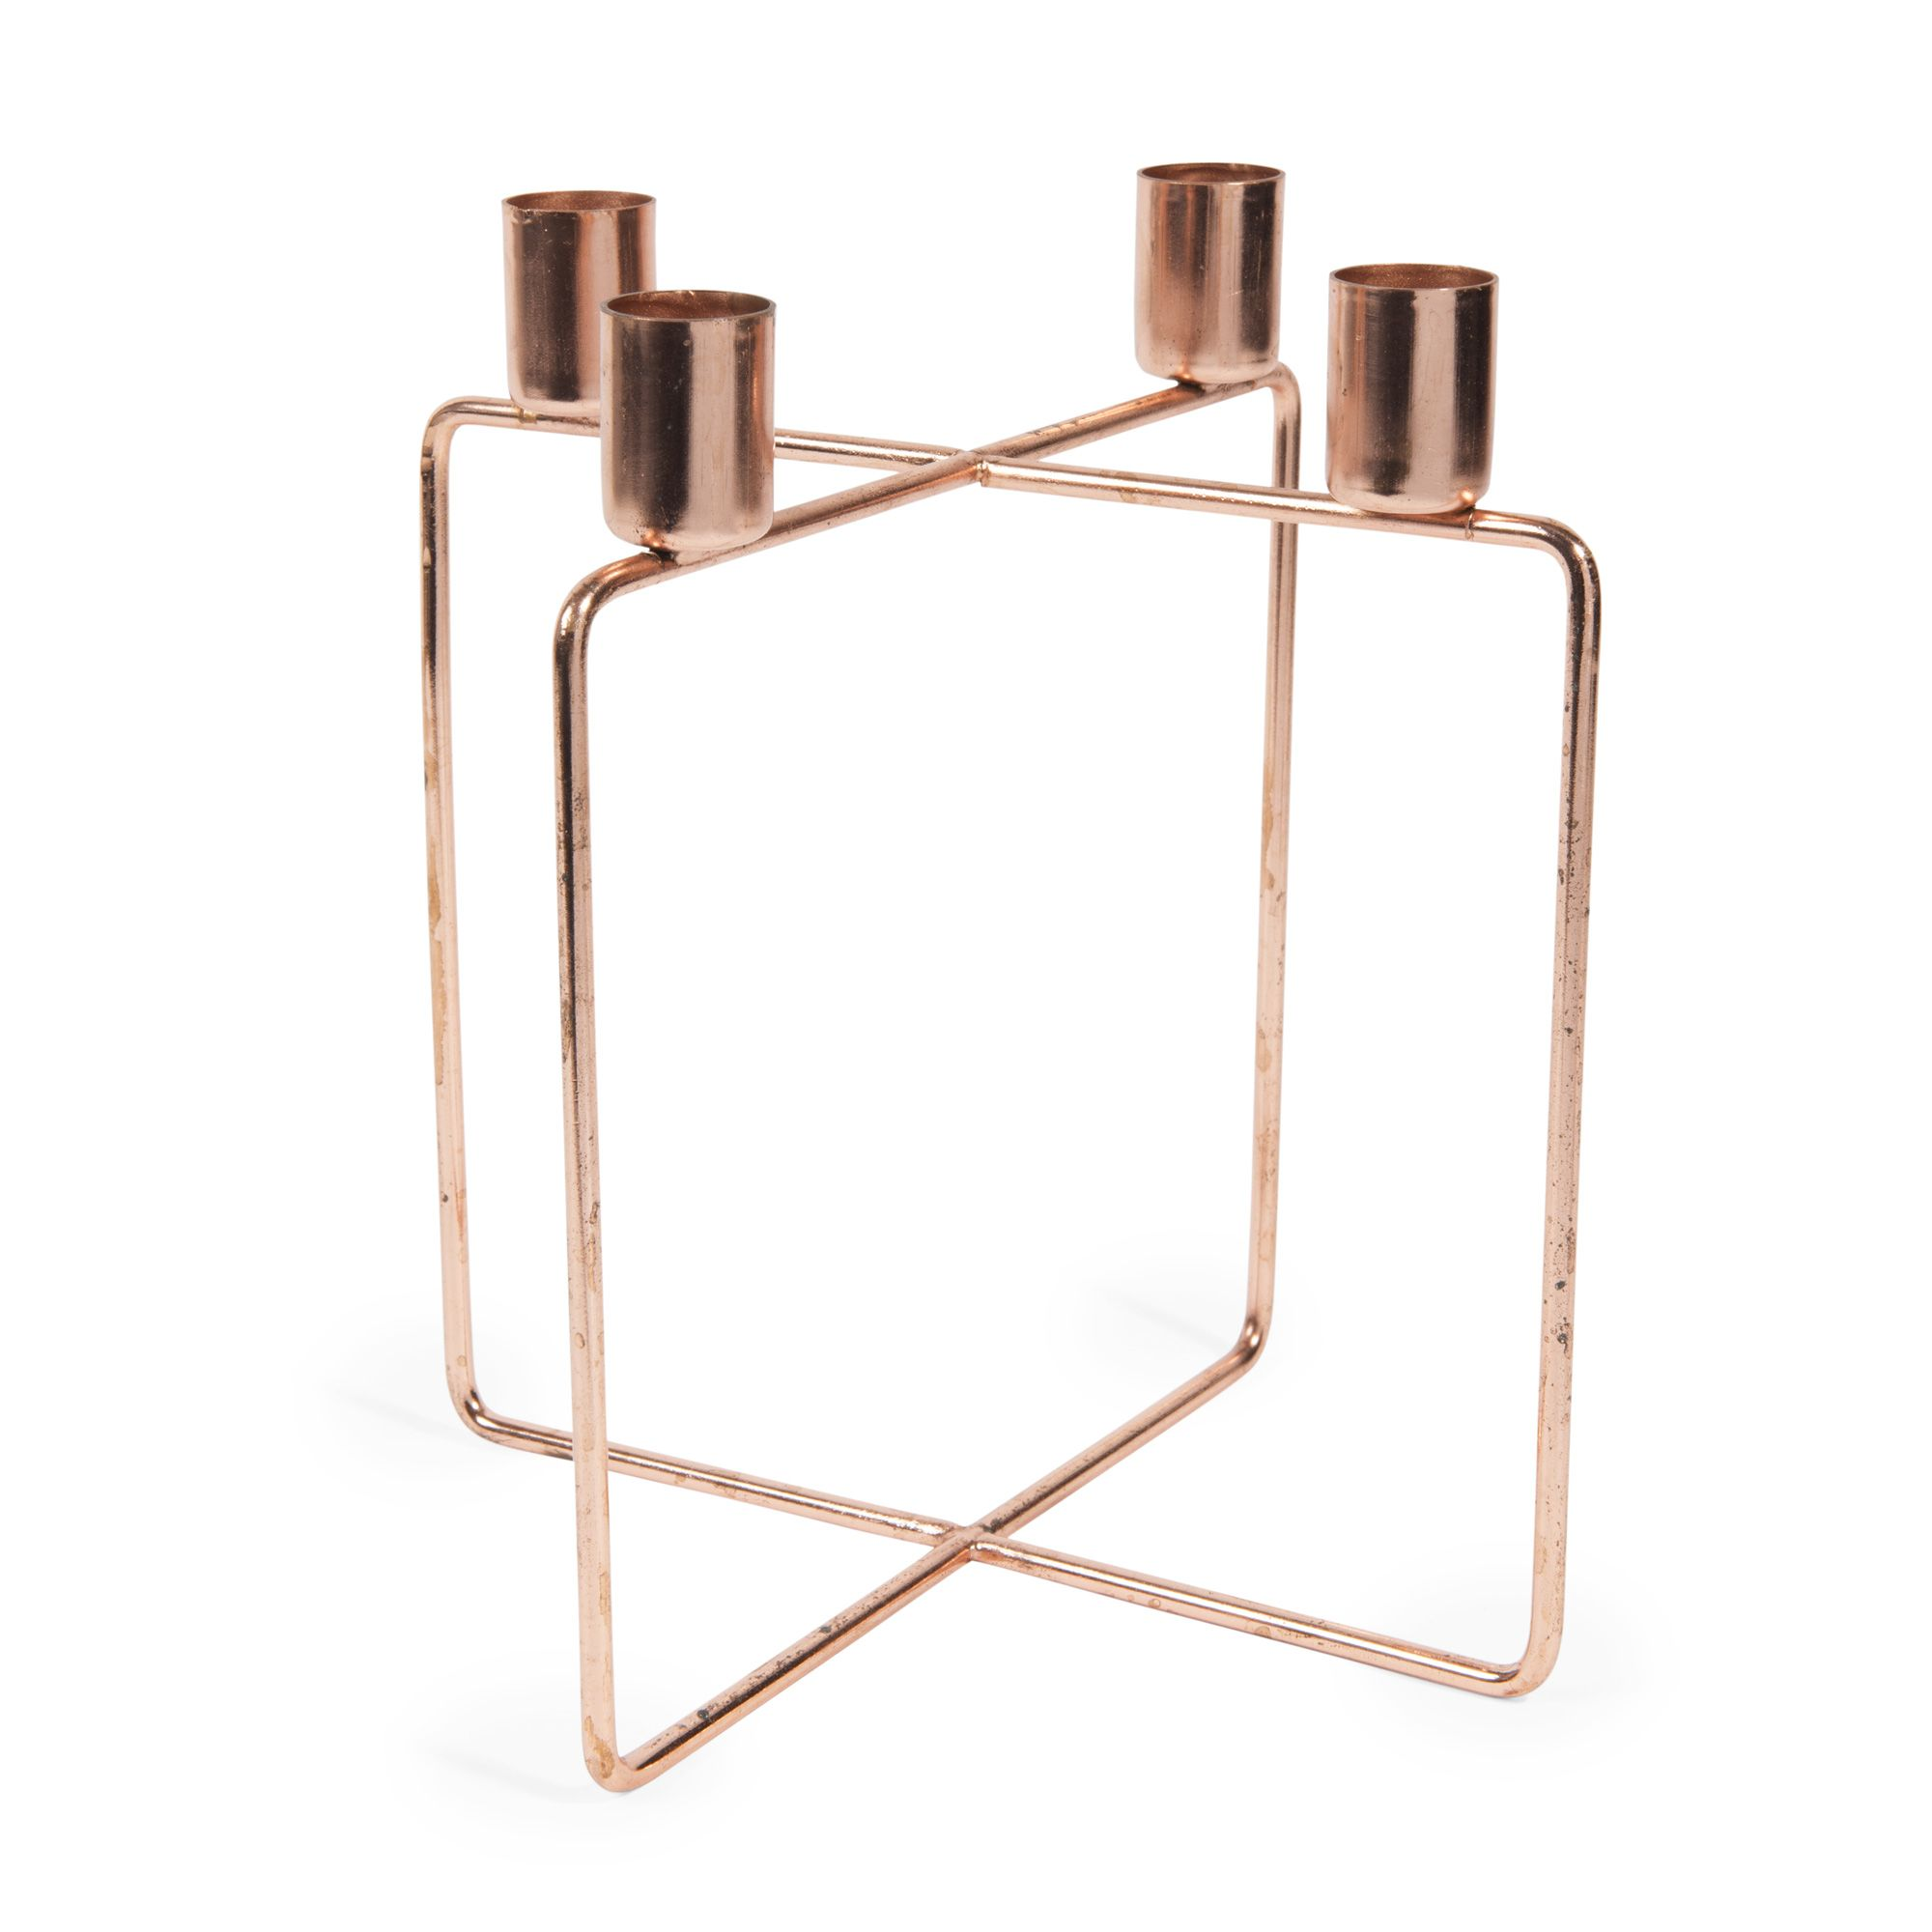 Kerzenhalter Soho Aus Metall In Kupferoptik H 21 Cm Maisons Du Monde Candelabros De Metal Metal Soho